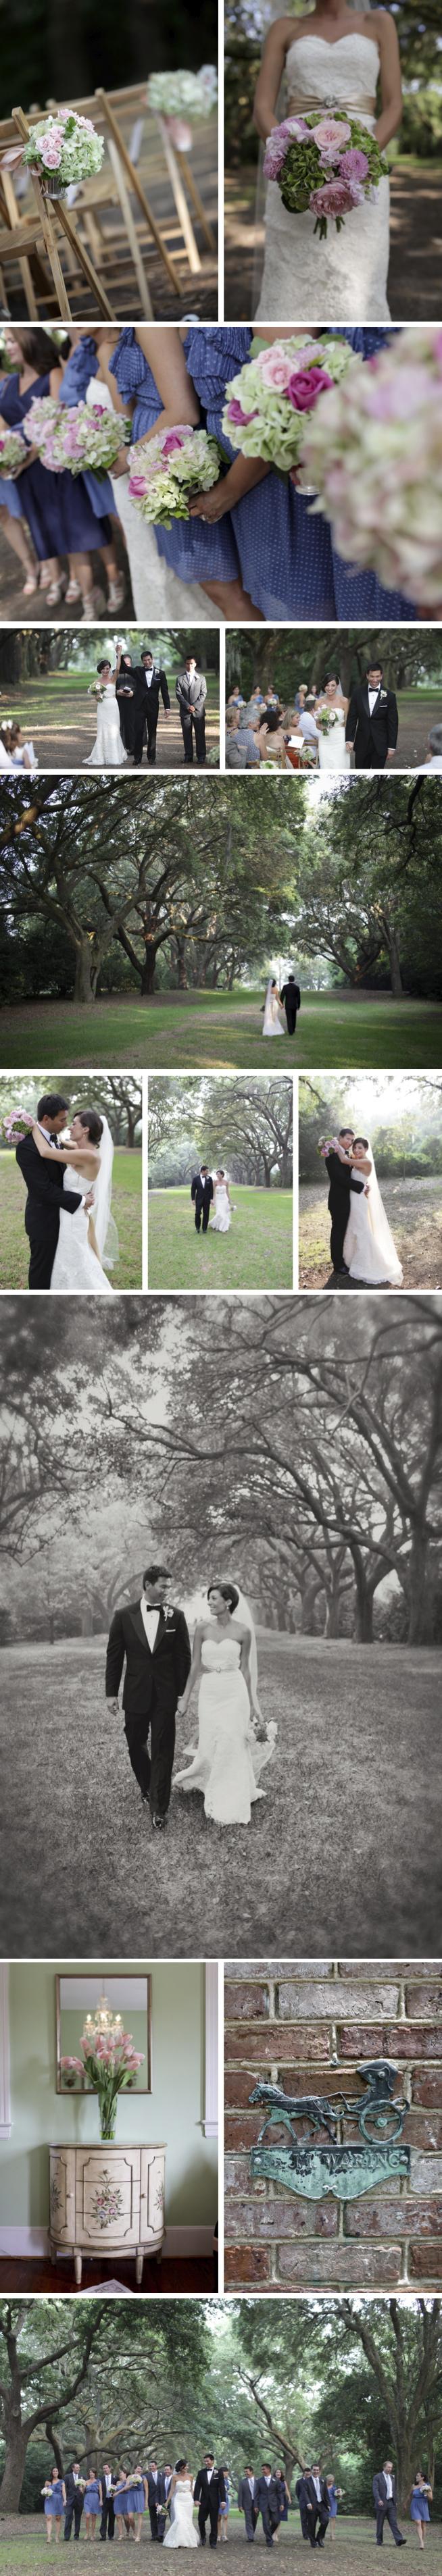 Legare Waring House Wedding2